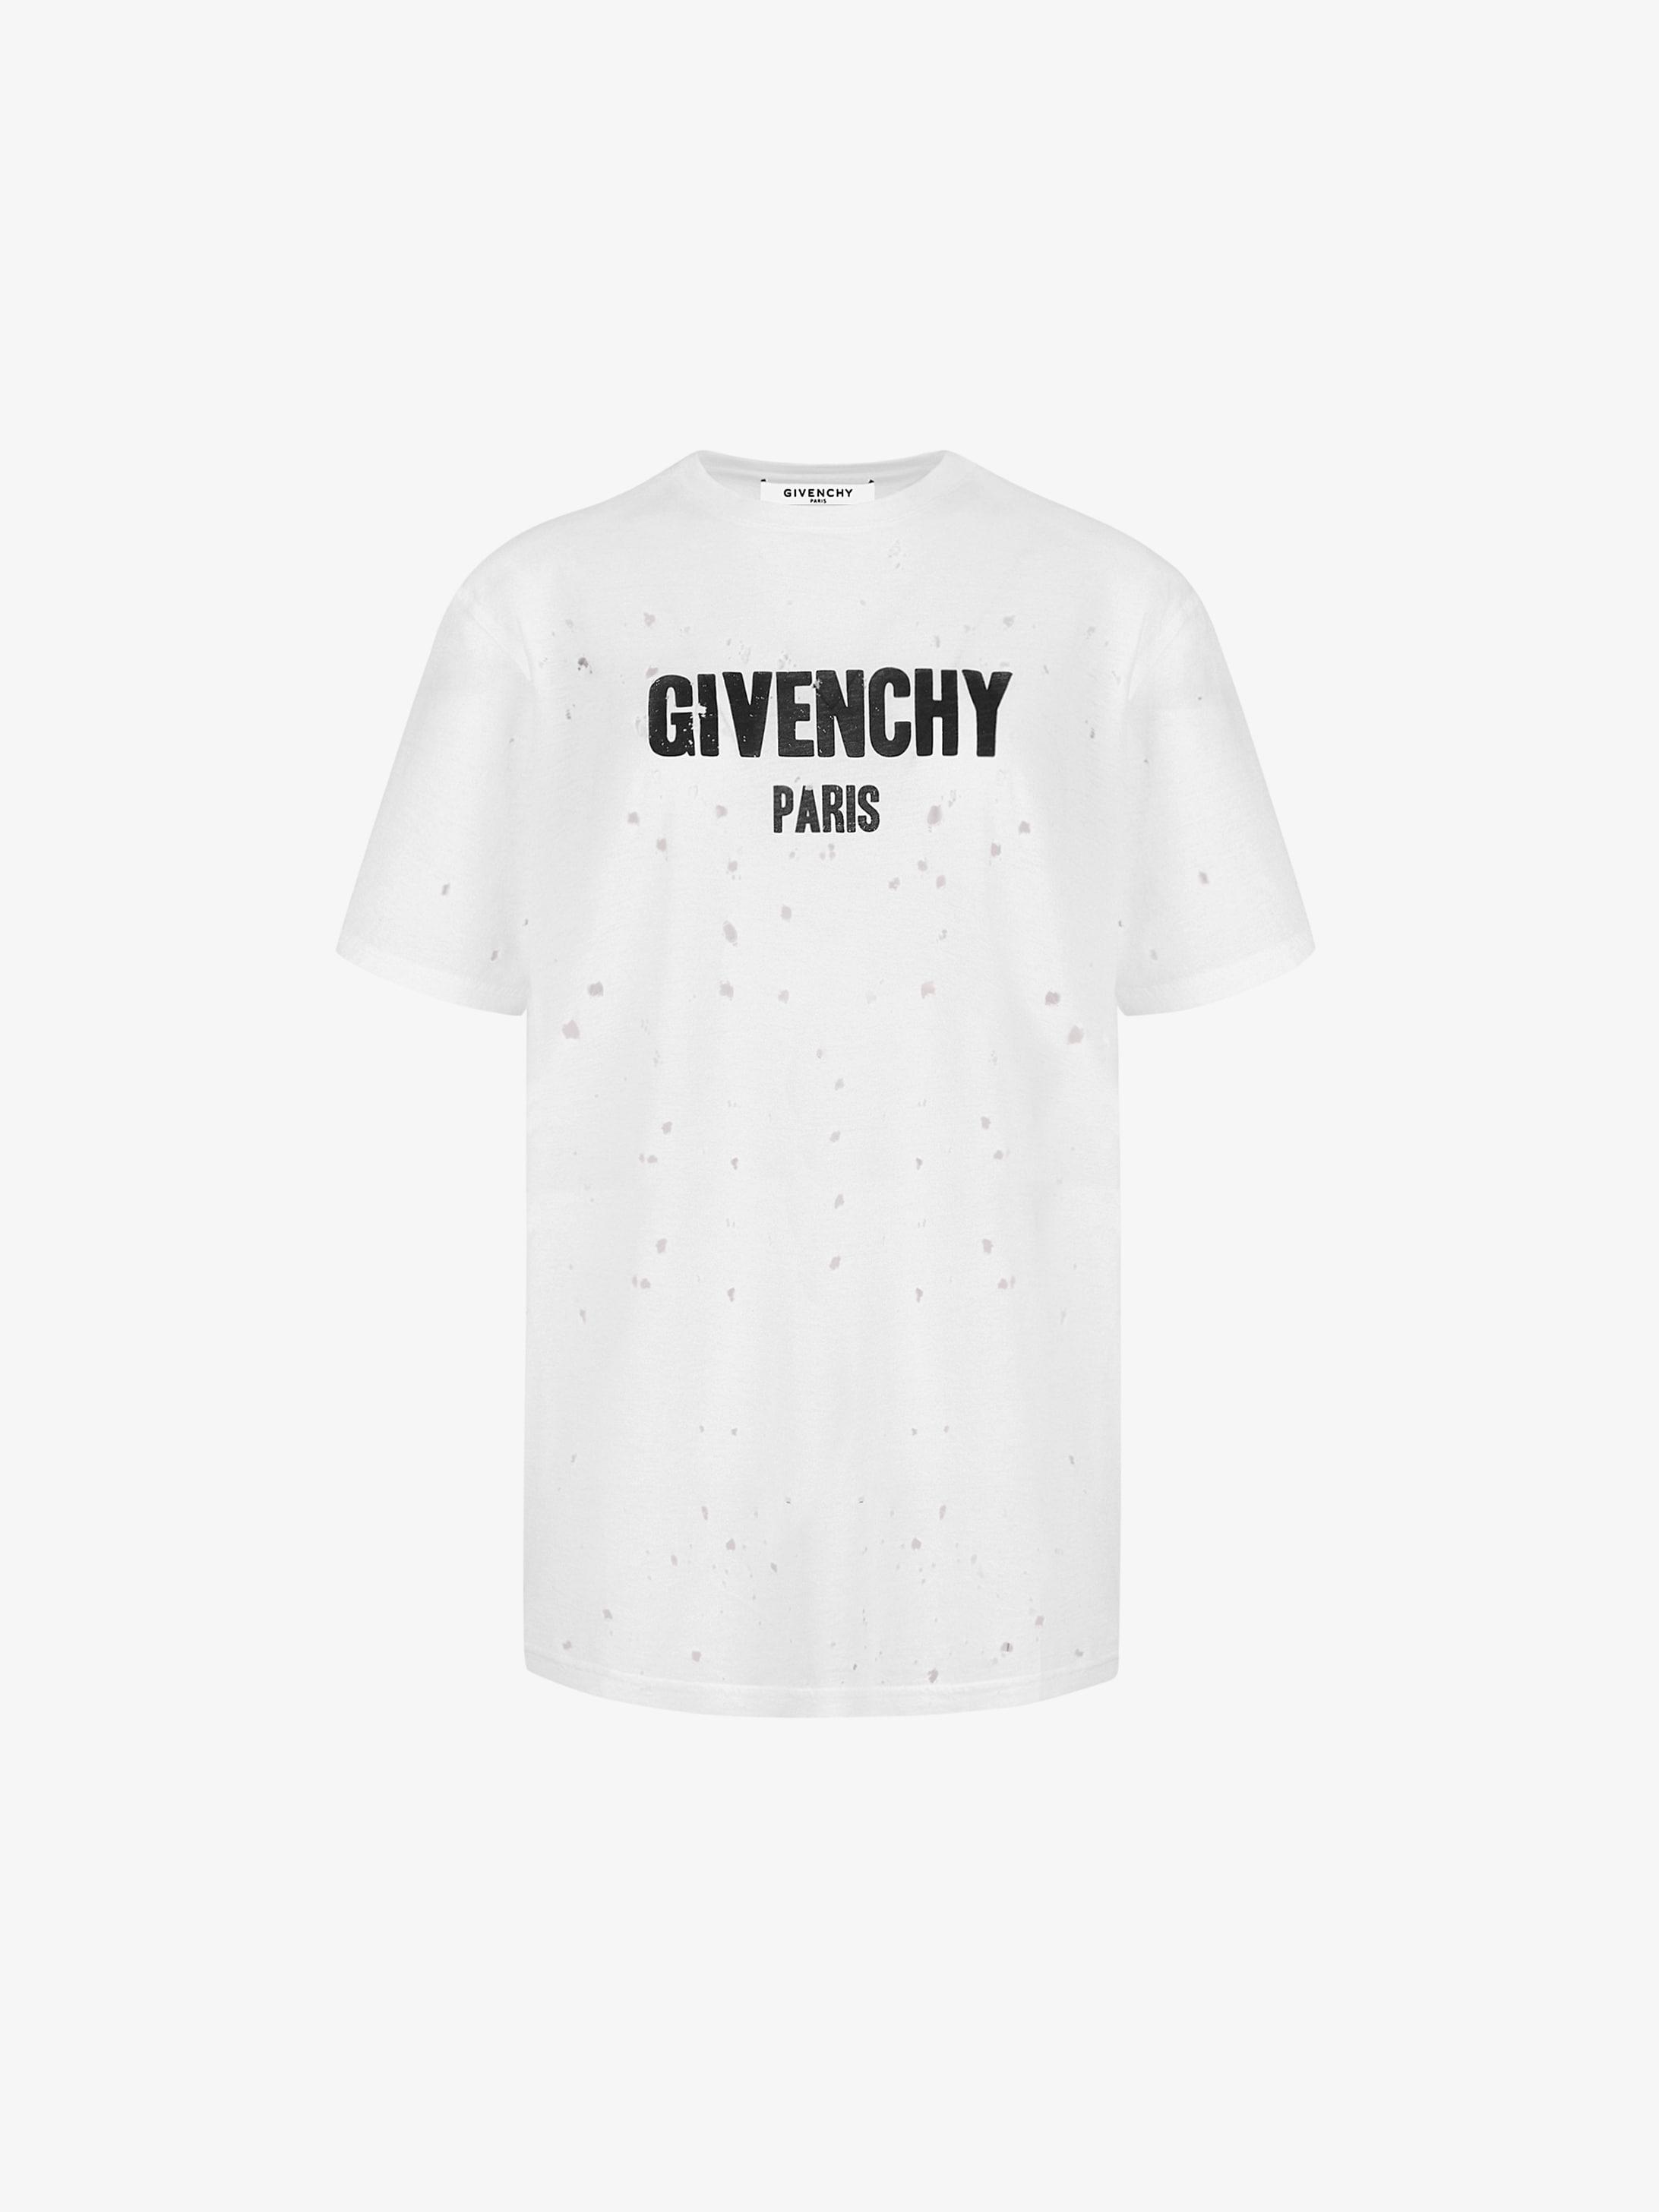 GIVENCHY PARIS destroyed t-shirt